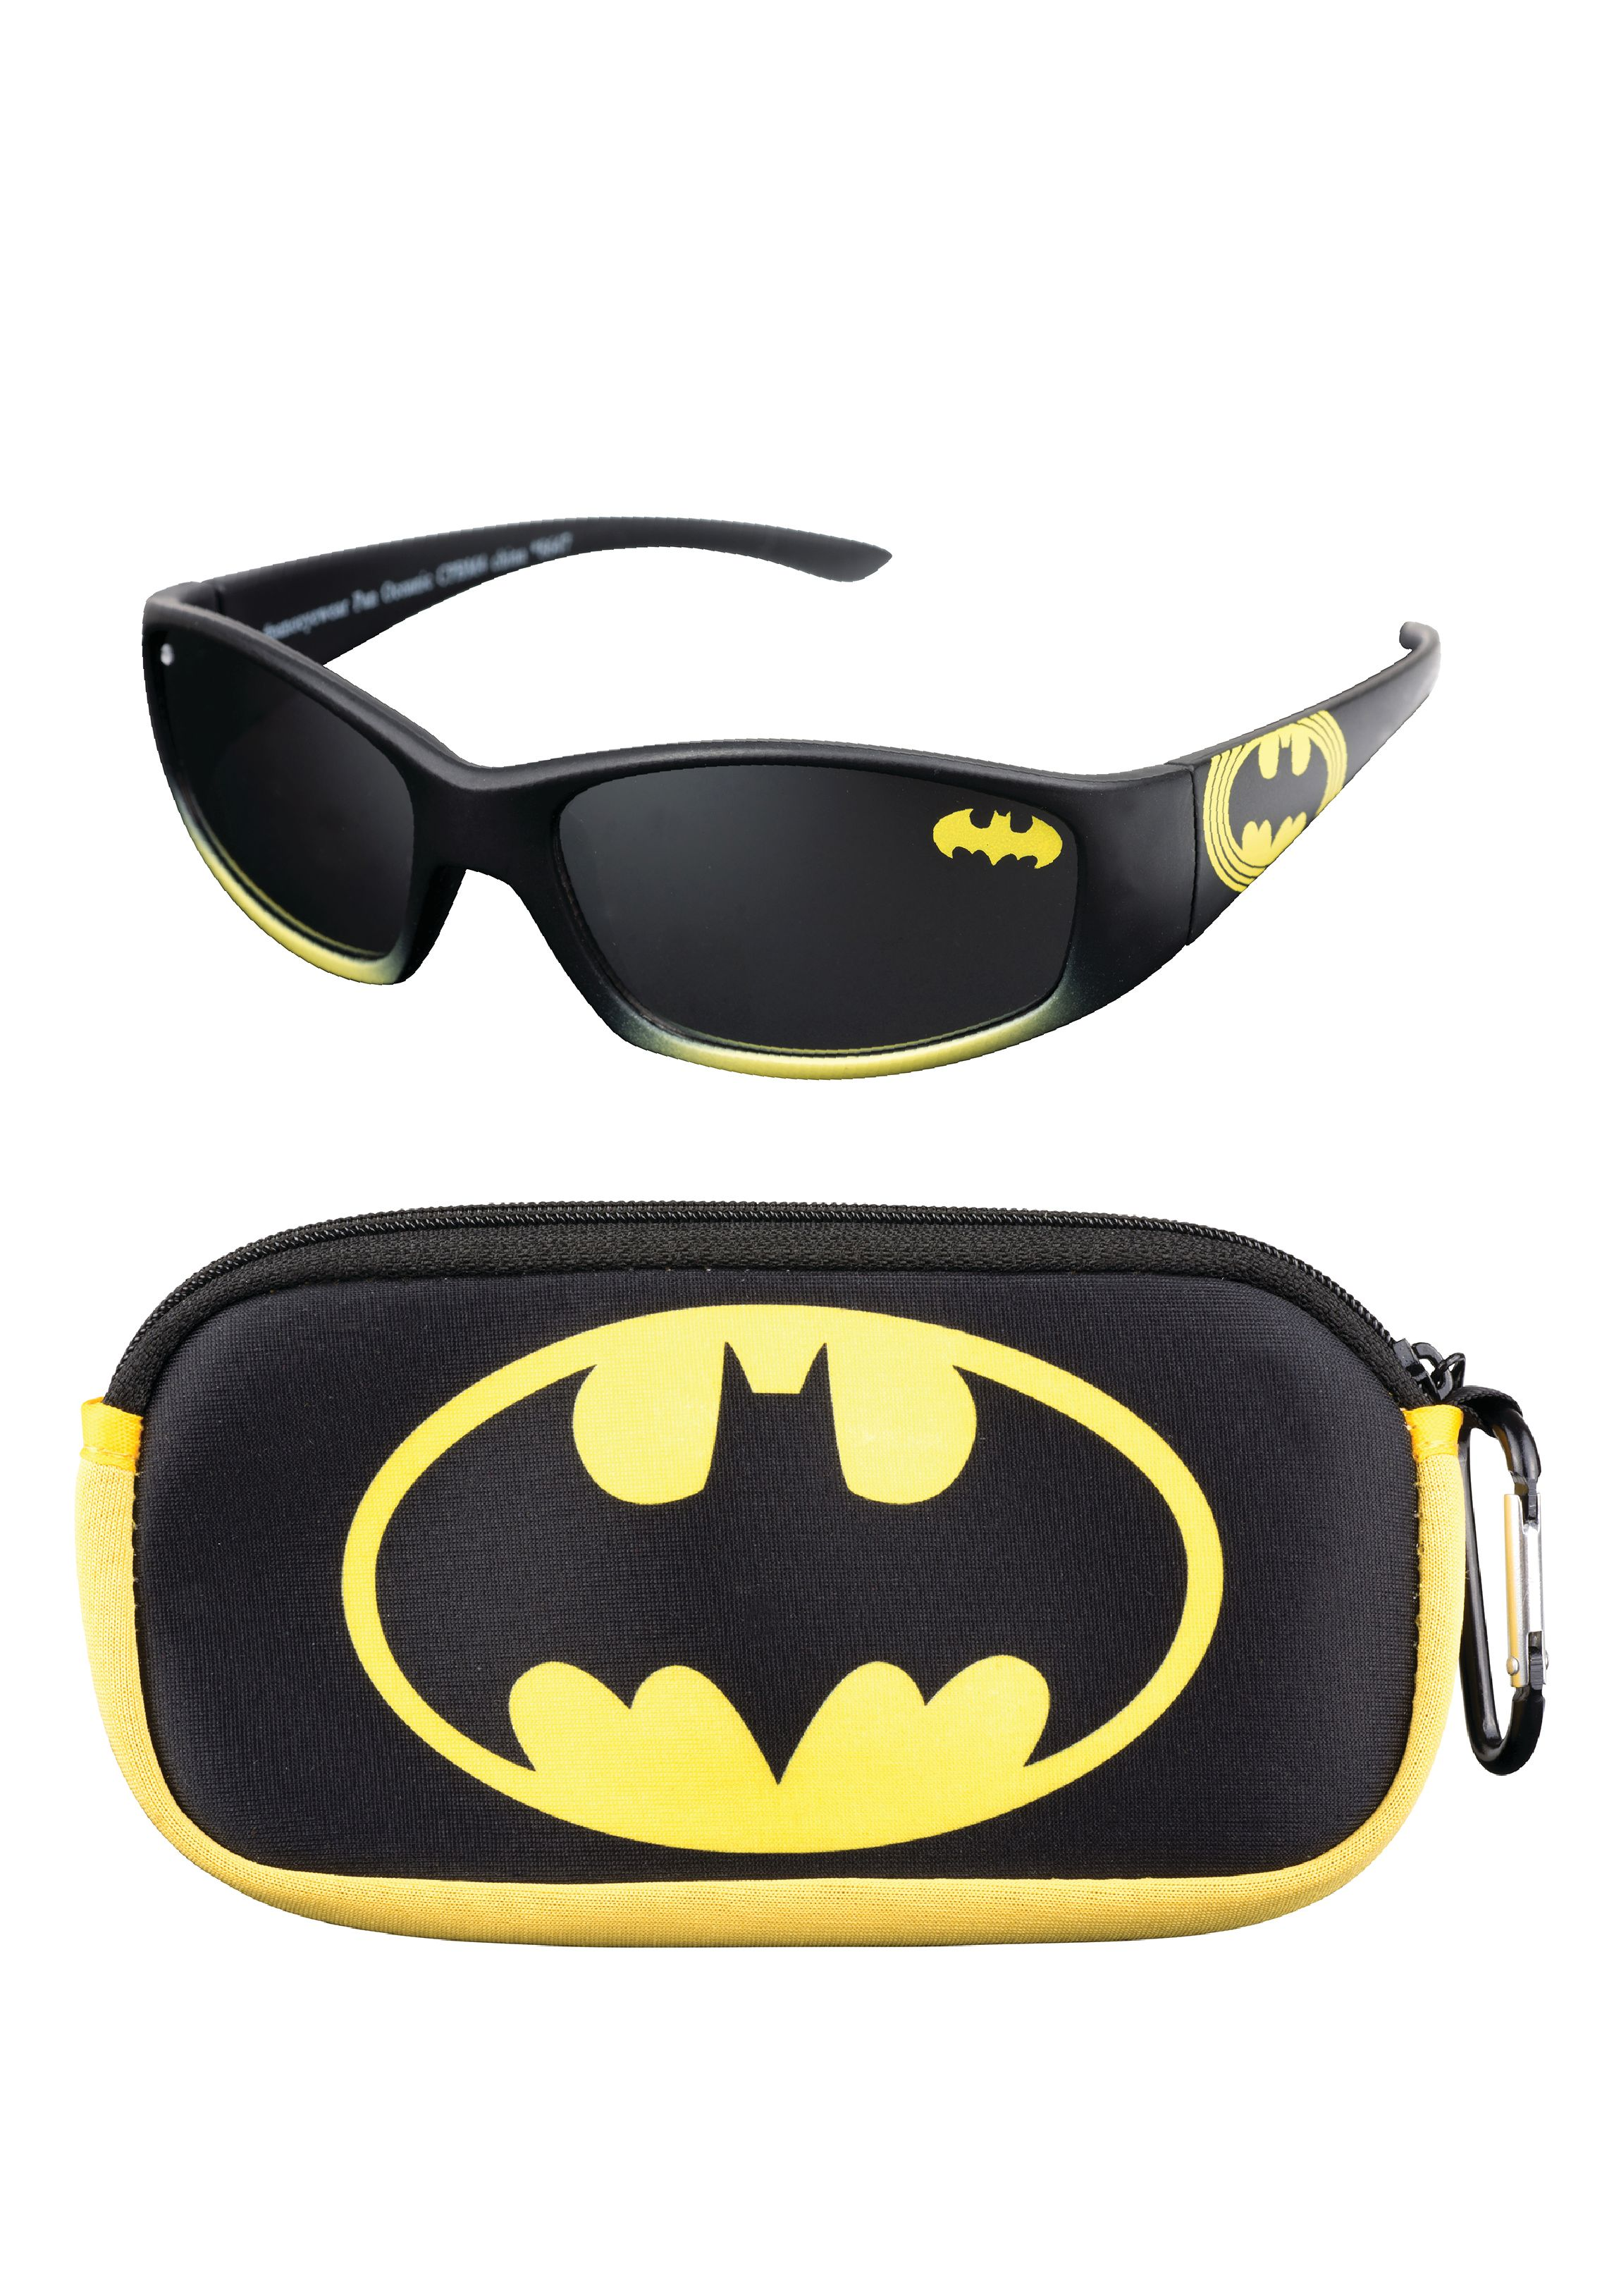 Batman Soft Case and Kid's Sunglasses Set